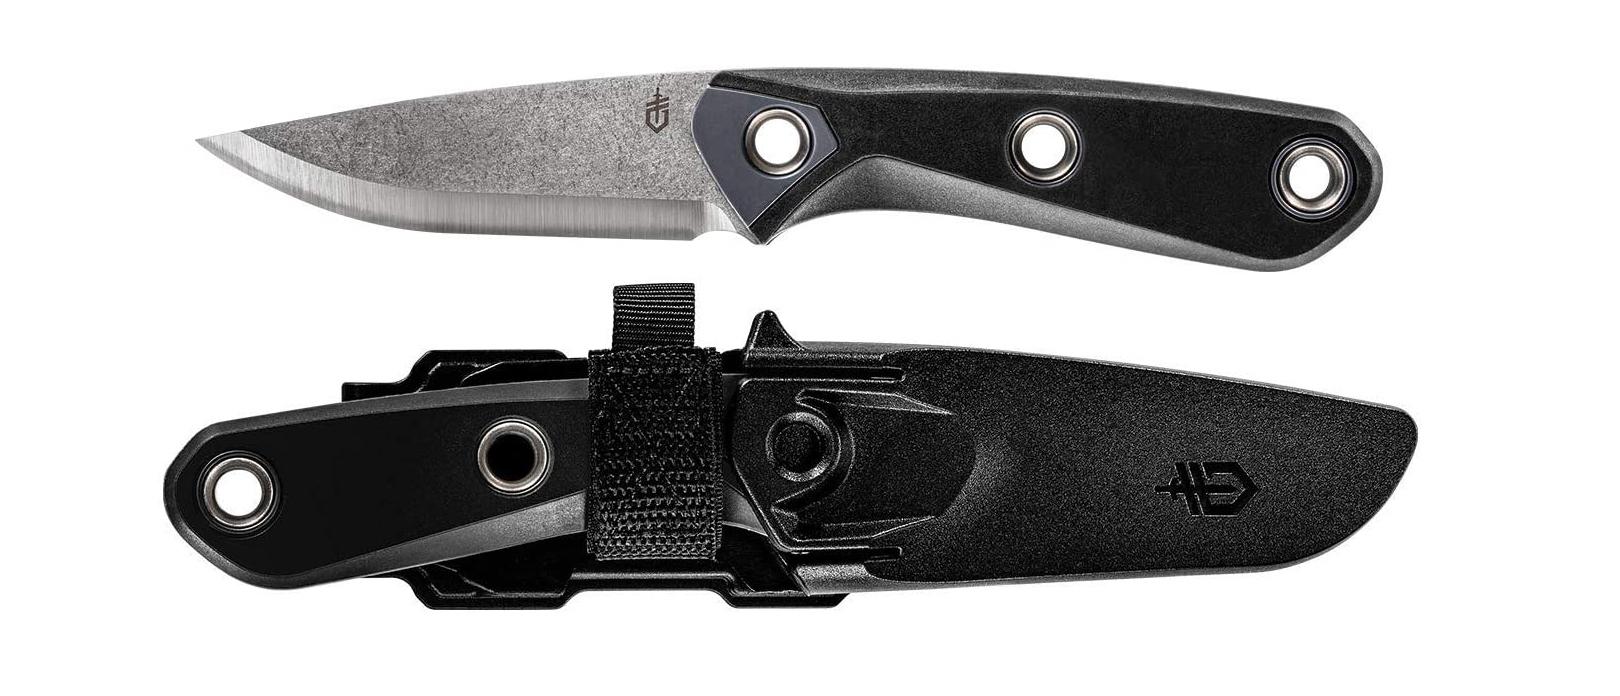 Bushcraft Knife: the gerber principle